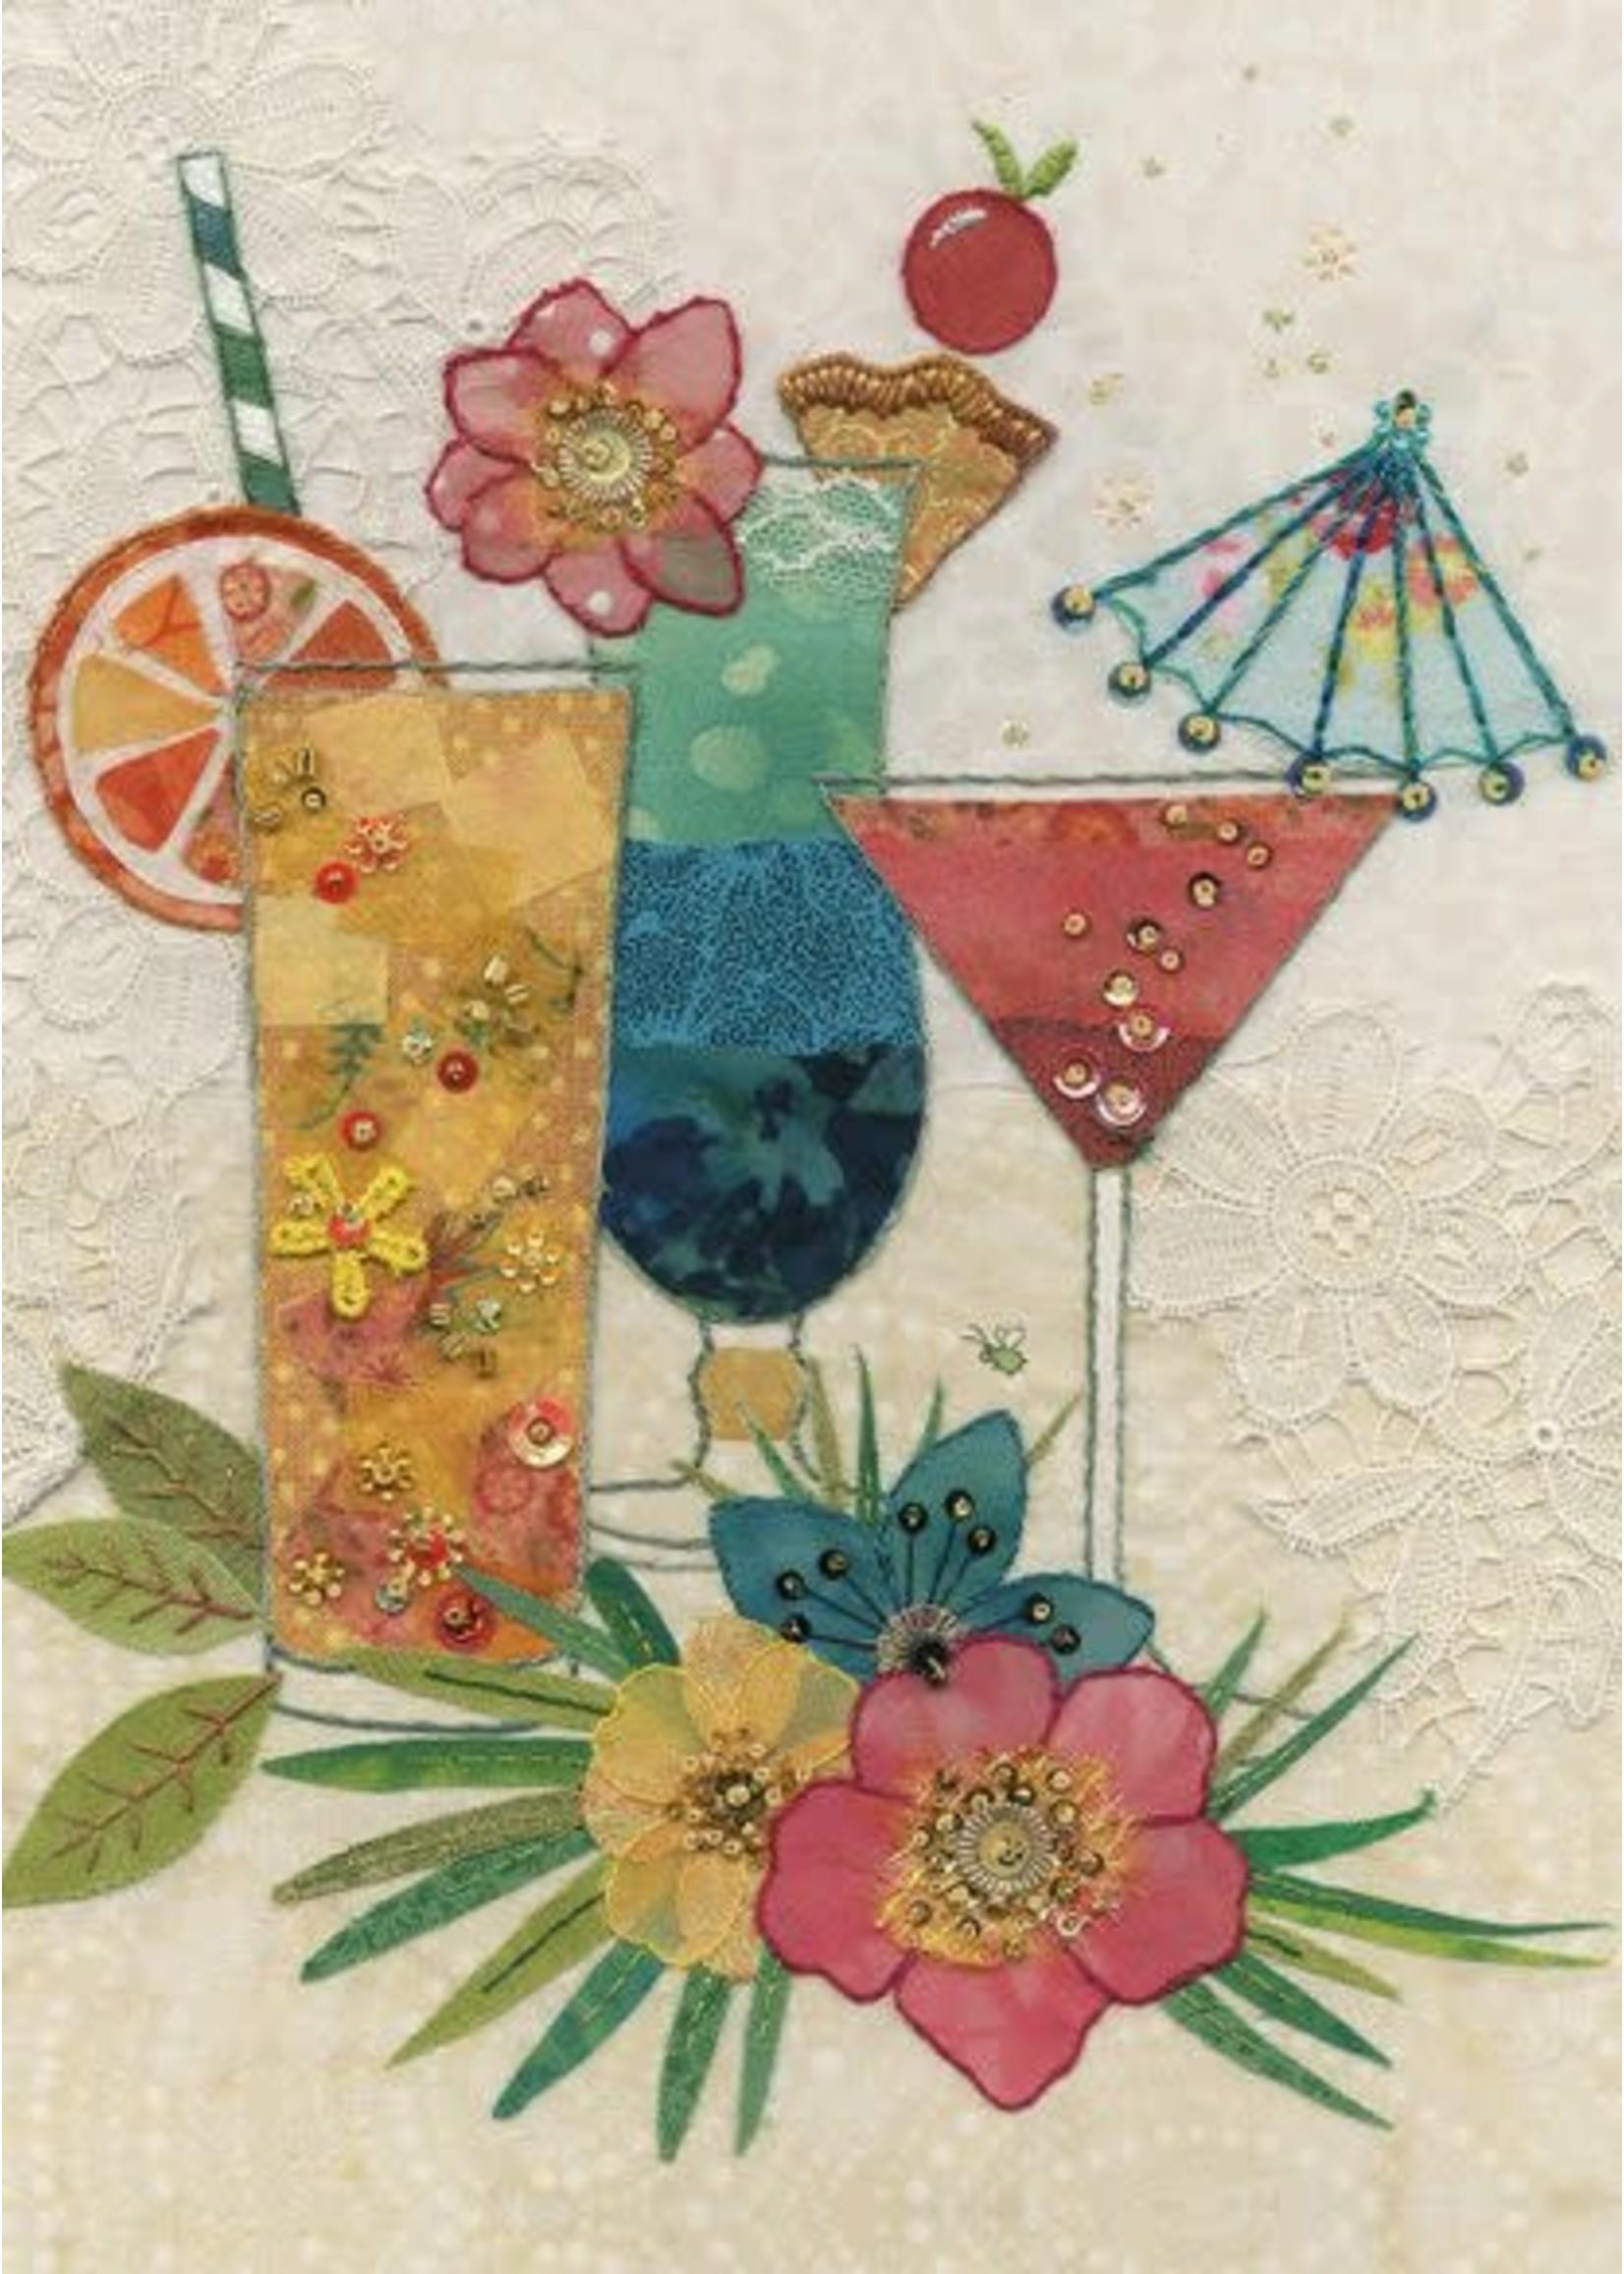 Bug Art Amy's Cards - Cocktails